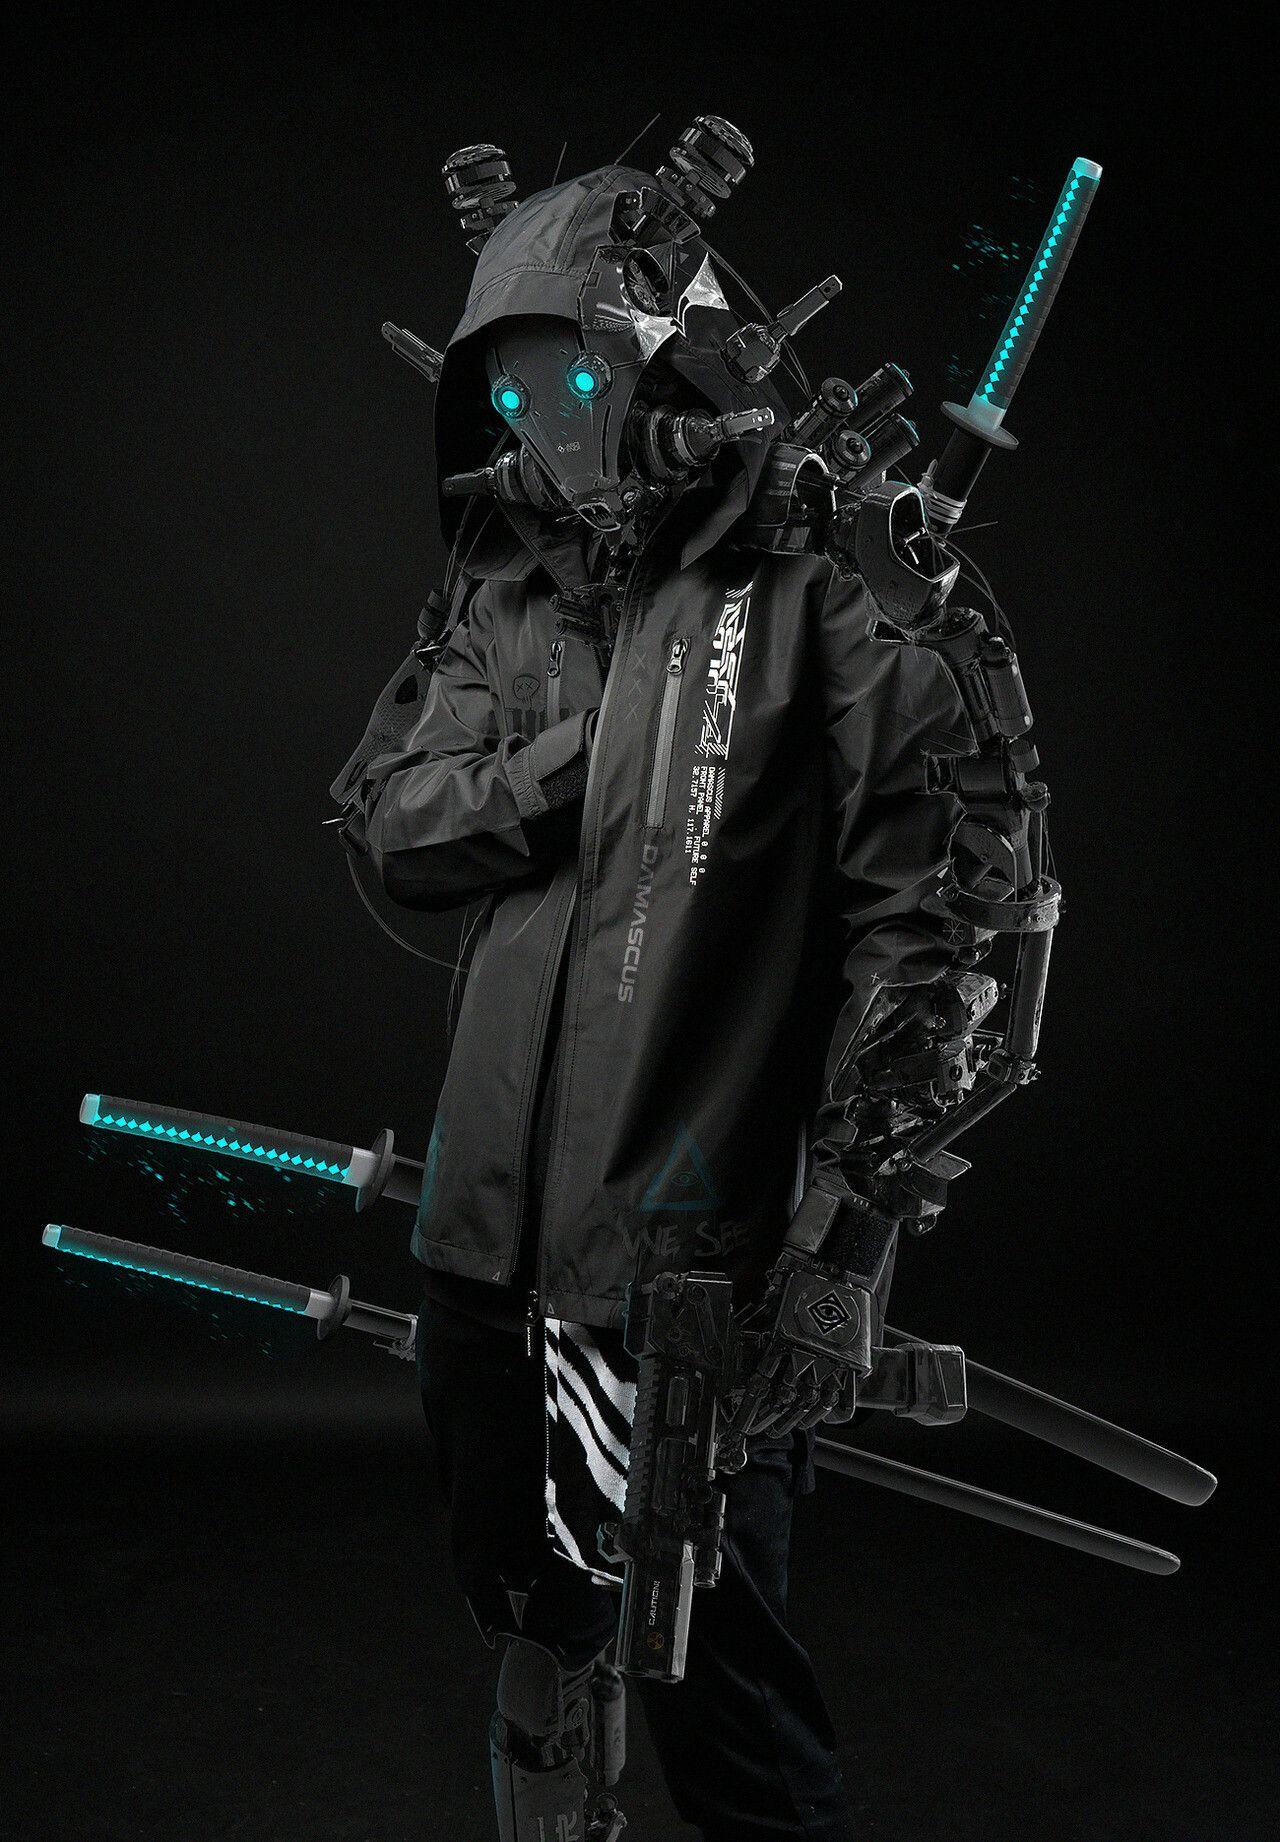 ArtStation - shenandoah phoenix x dmcs + robo ninja, Ahmet Atıl Akar